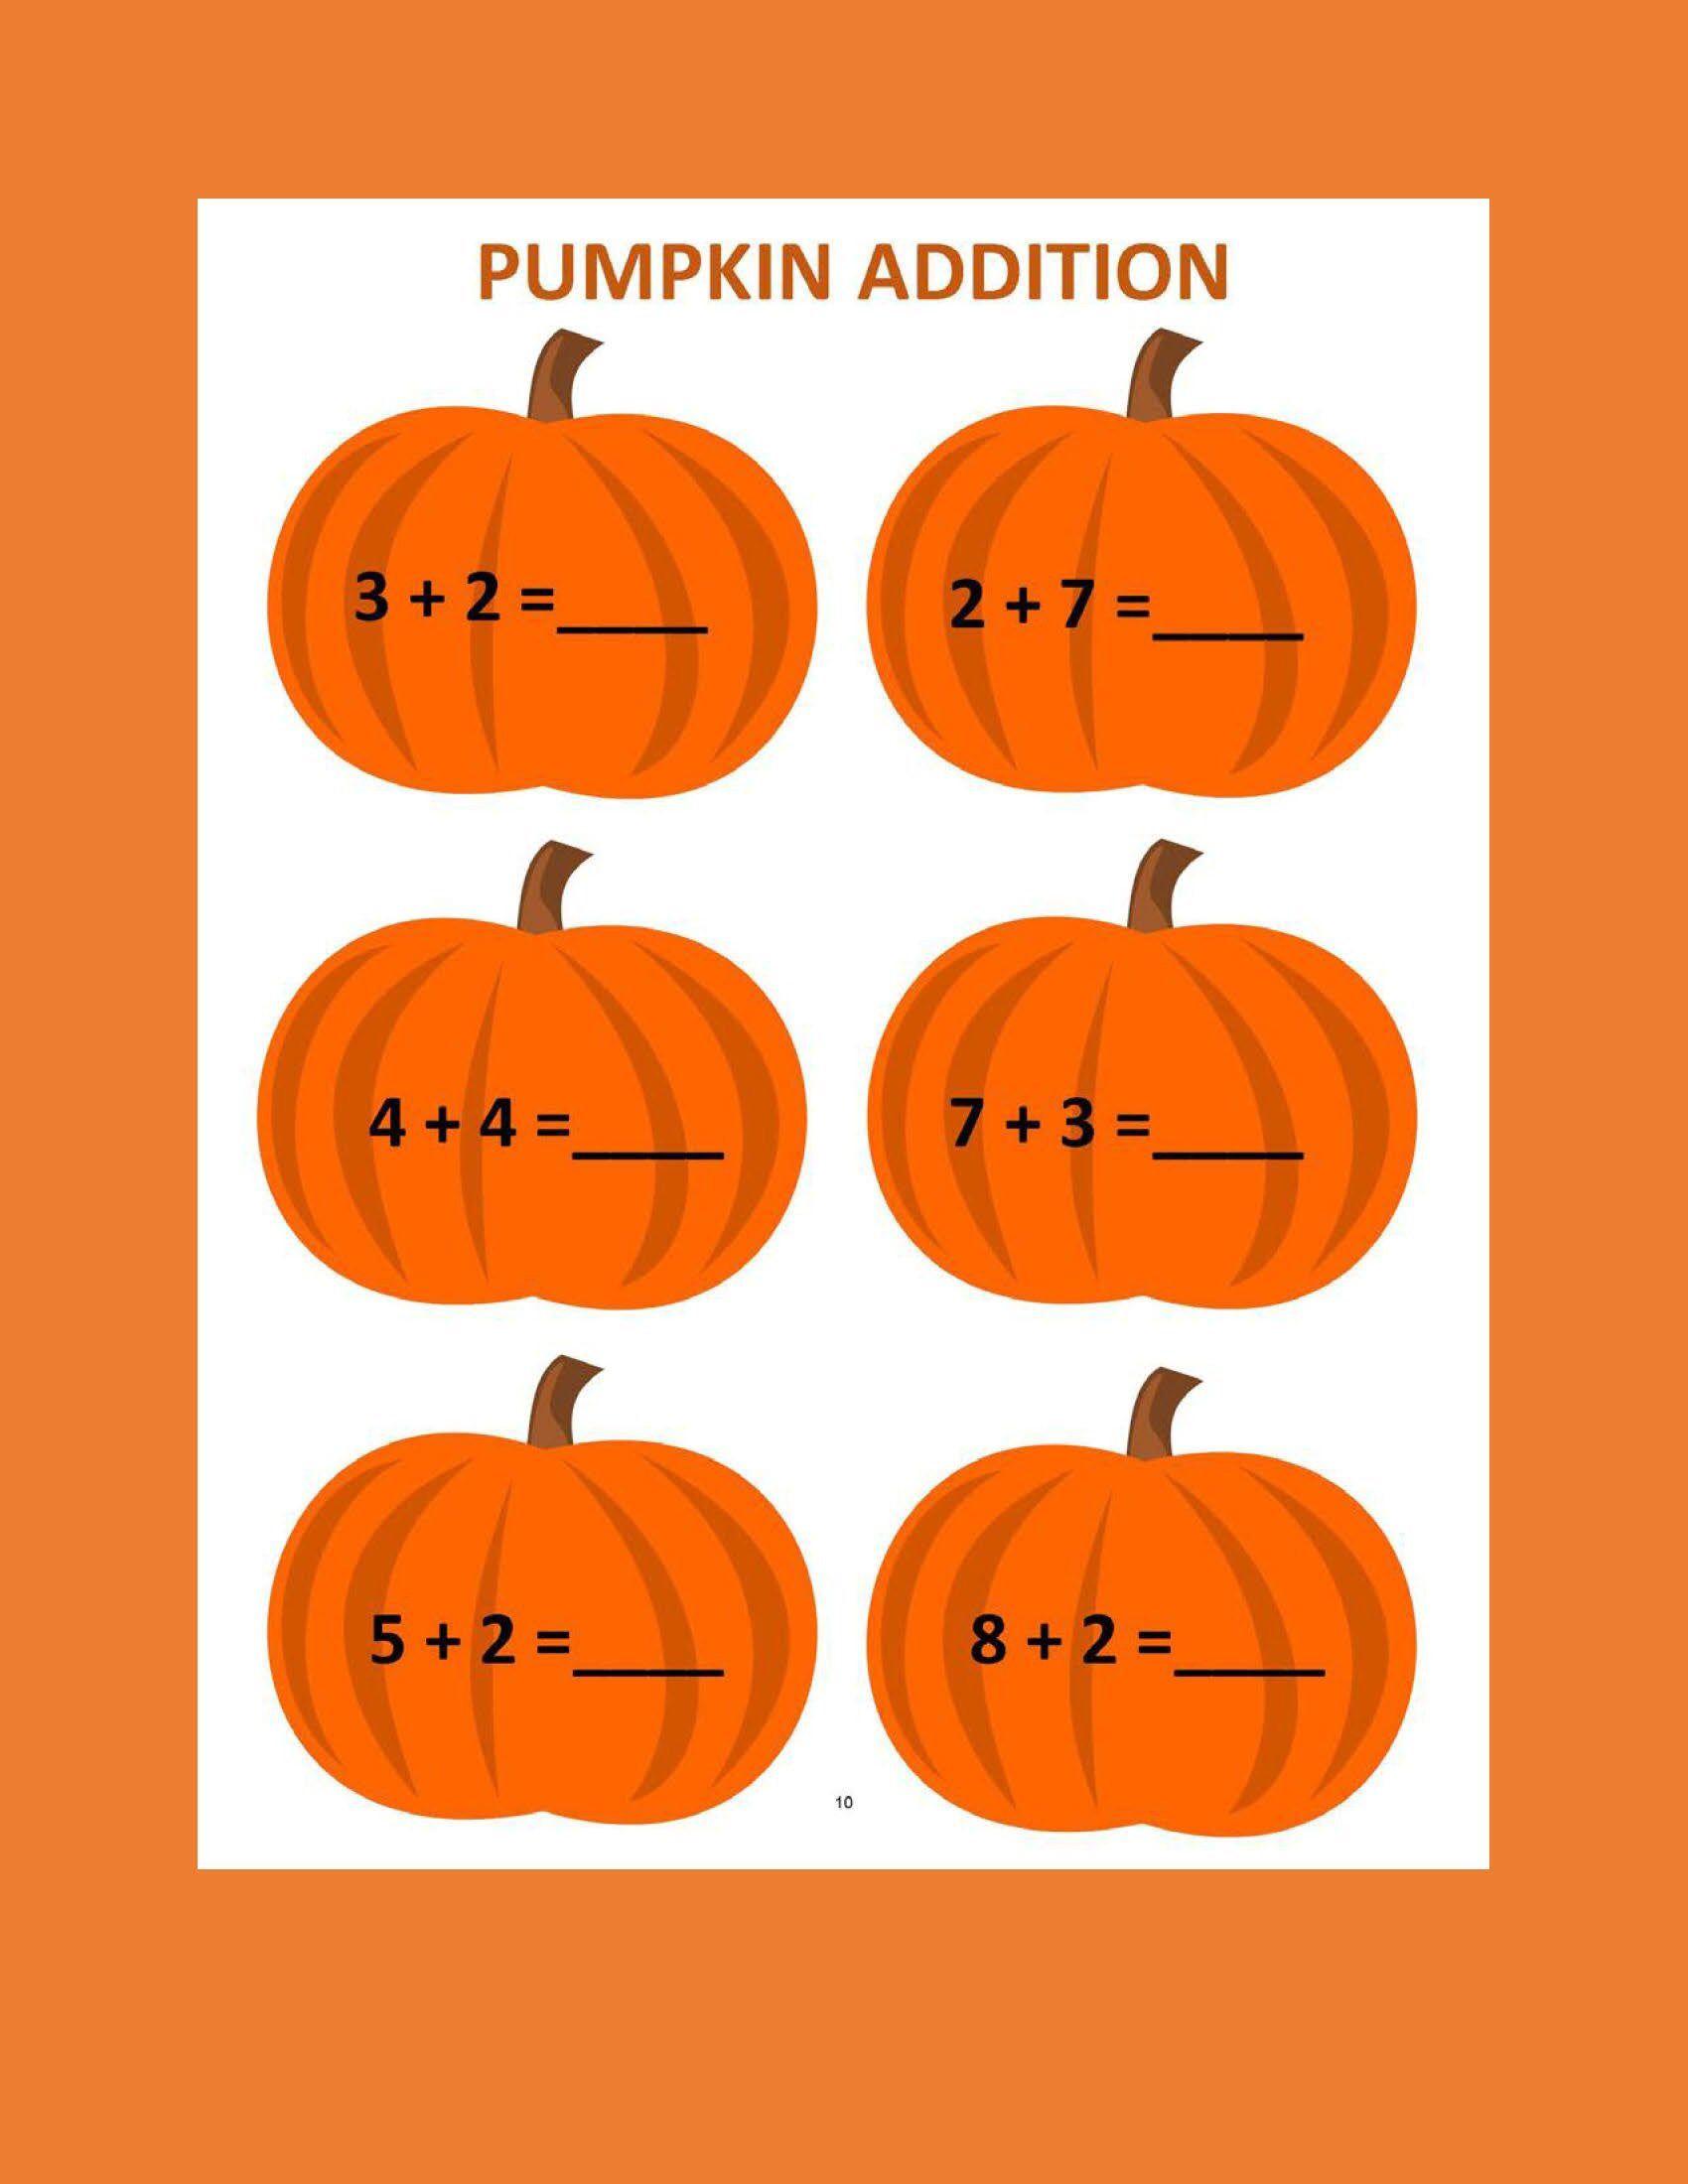 Pumpkin Addition A 12 Worksheets Preschool